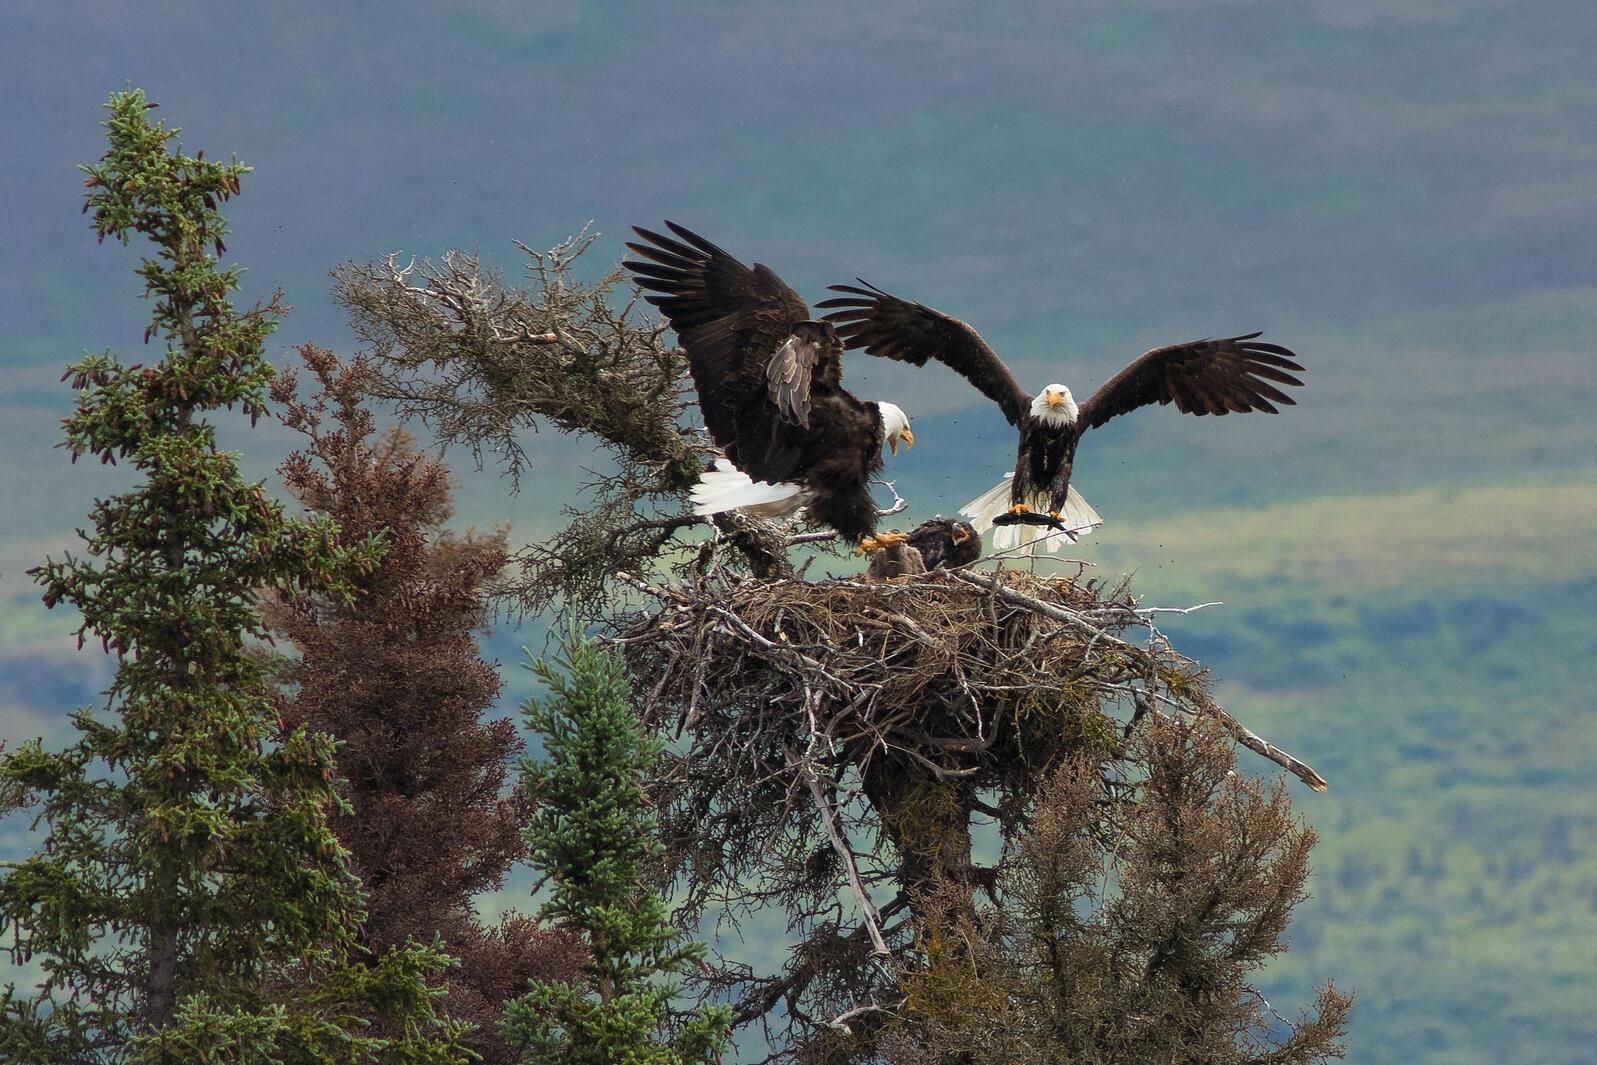 Bald Eagles. Ed MacKerrow/Audubon Photography Awards